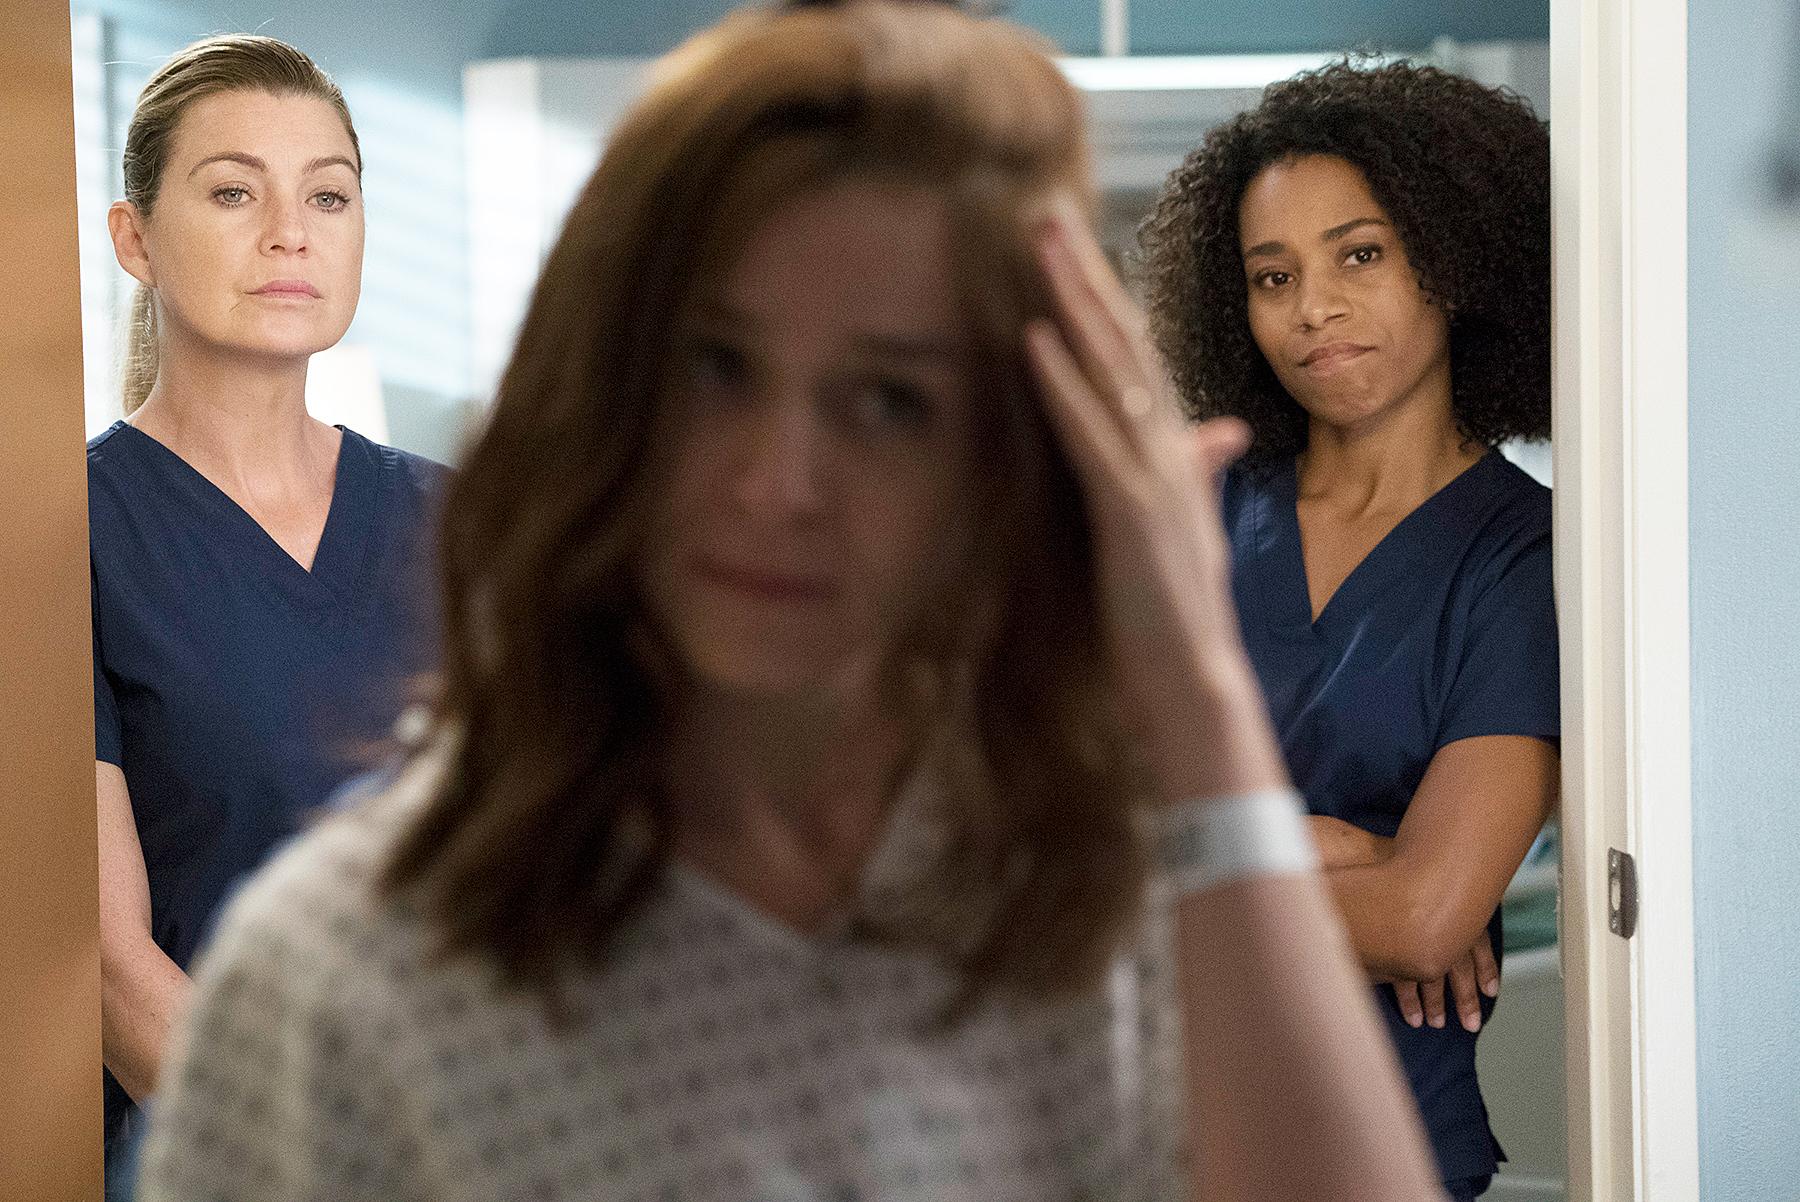 ELLEN POMPEO, CATERINA SCORSONE, KELLY MCCREARY Grey's Anatomy